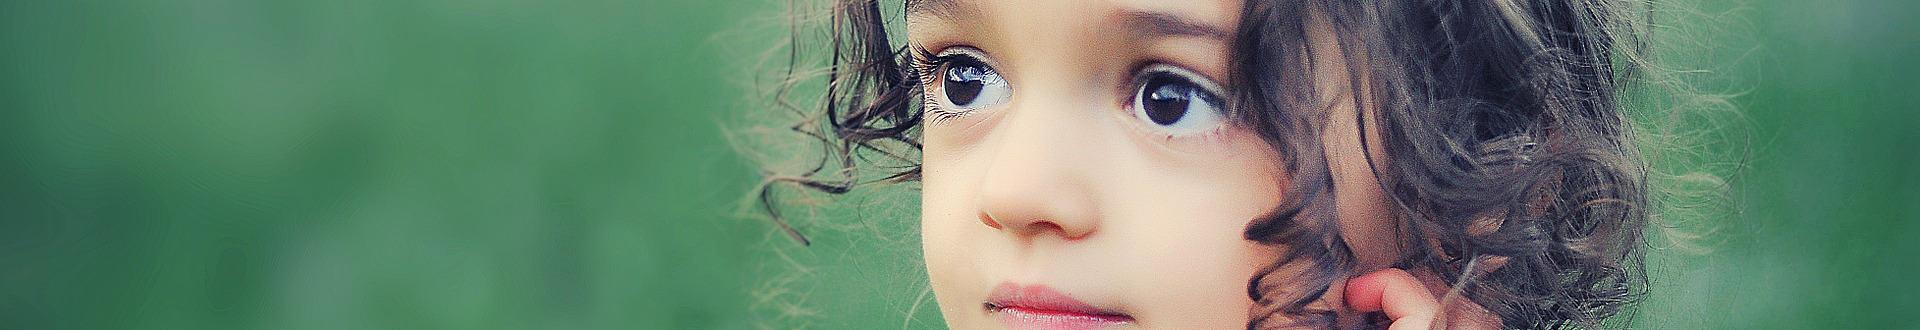 kinderarmut nimmt zu - Kinderarmut nimmt weiter zu